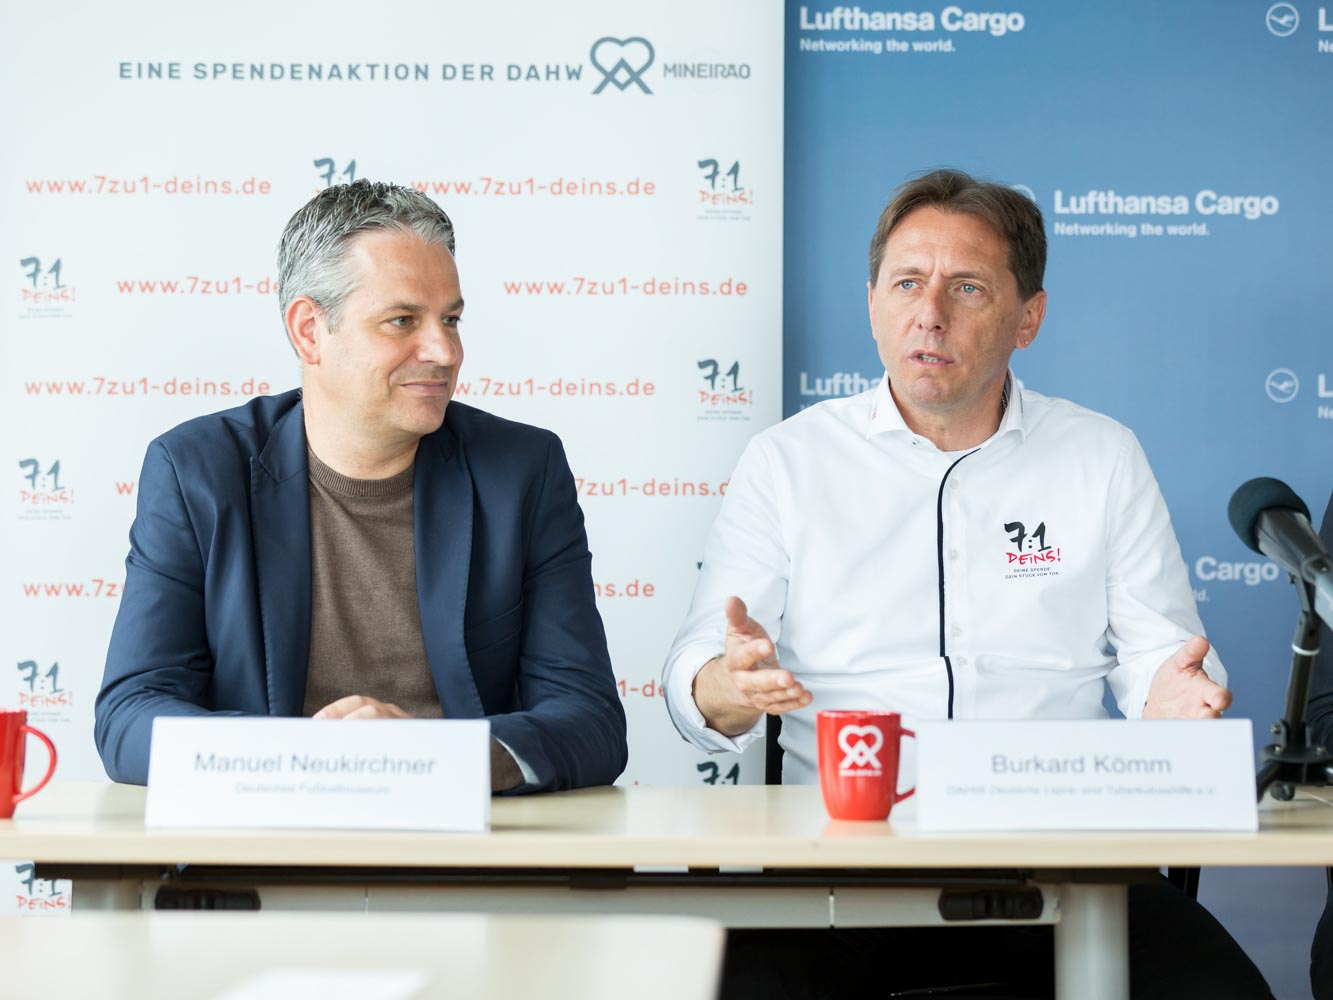 reportage_daniel_kummer-lufthansa_cargo_dahw_2018-01